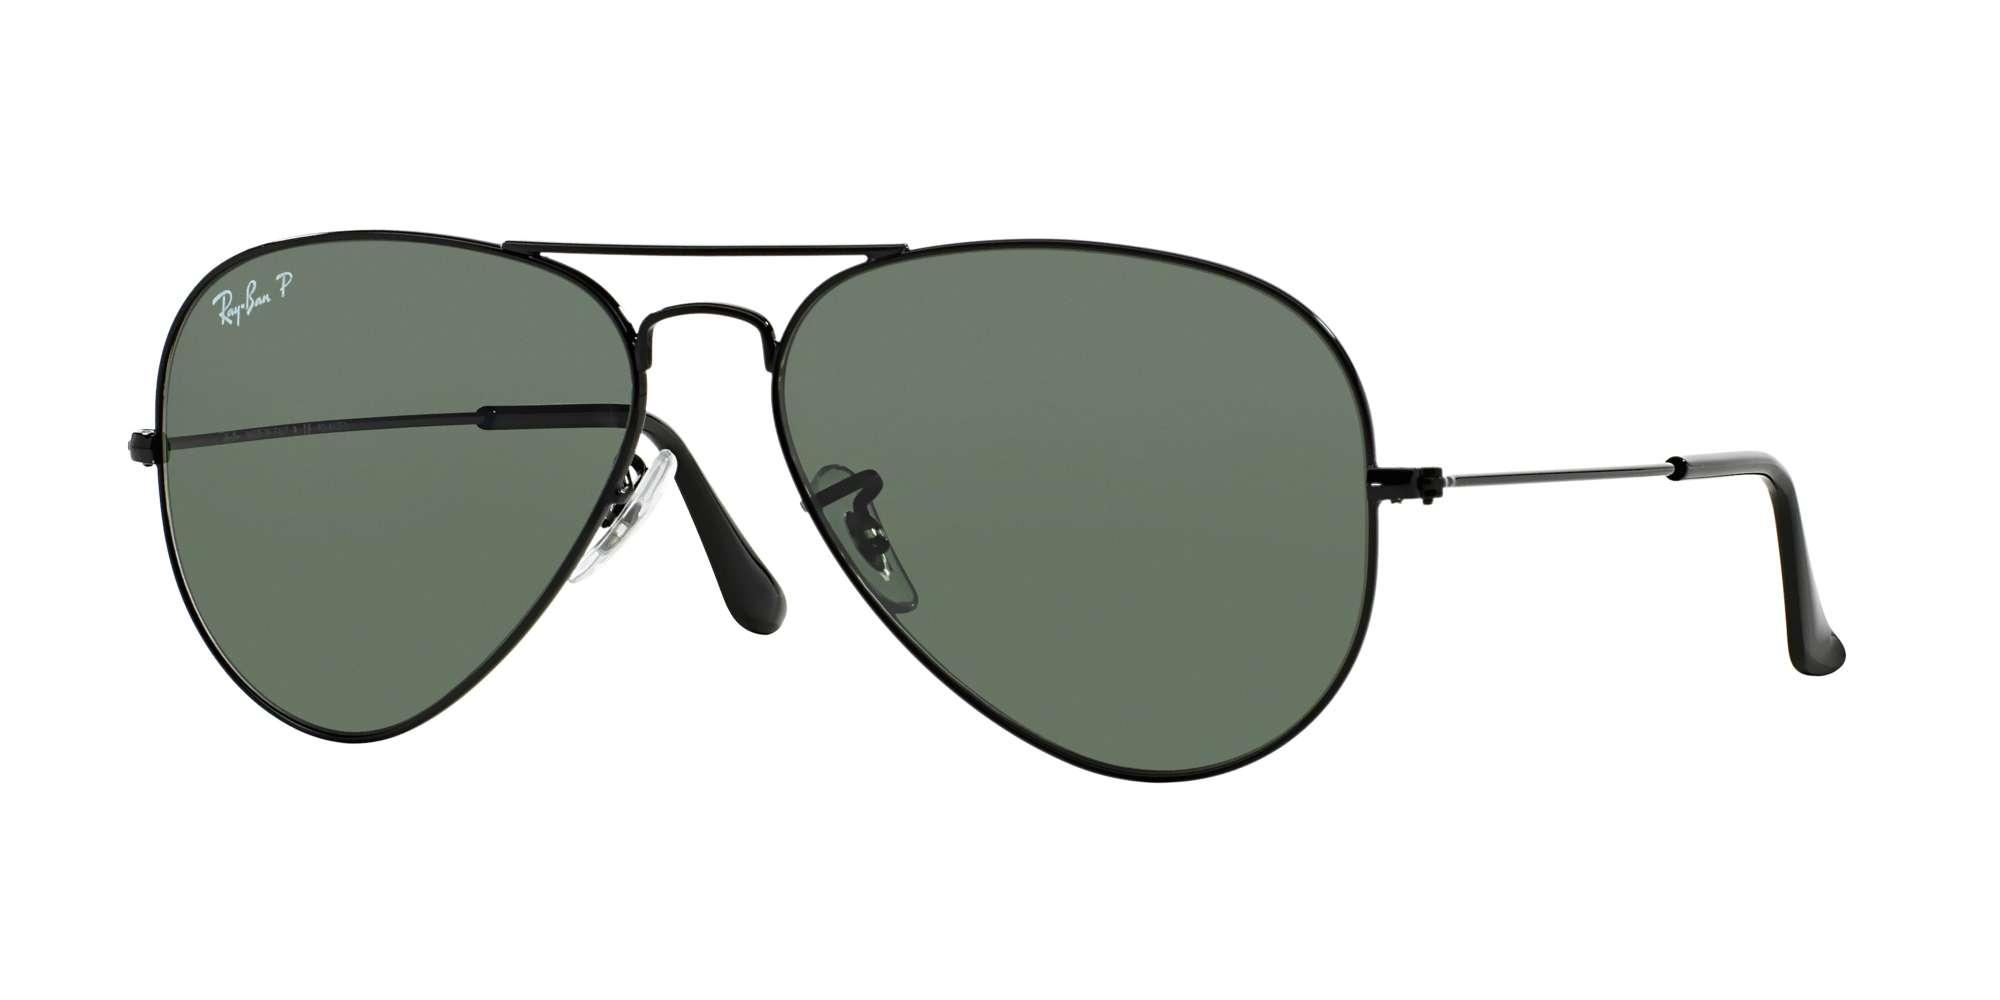 BLACK / CRYSTAL GREEN POLARIZED lenses